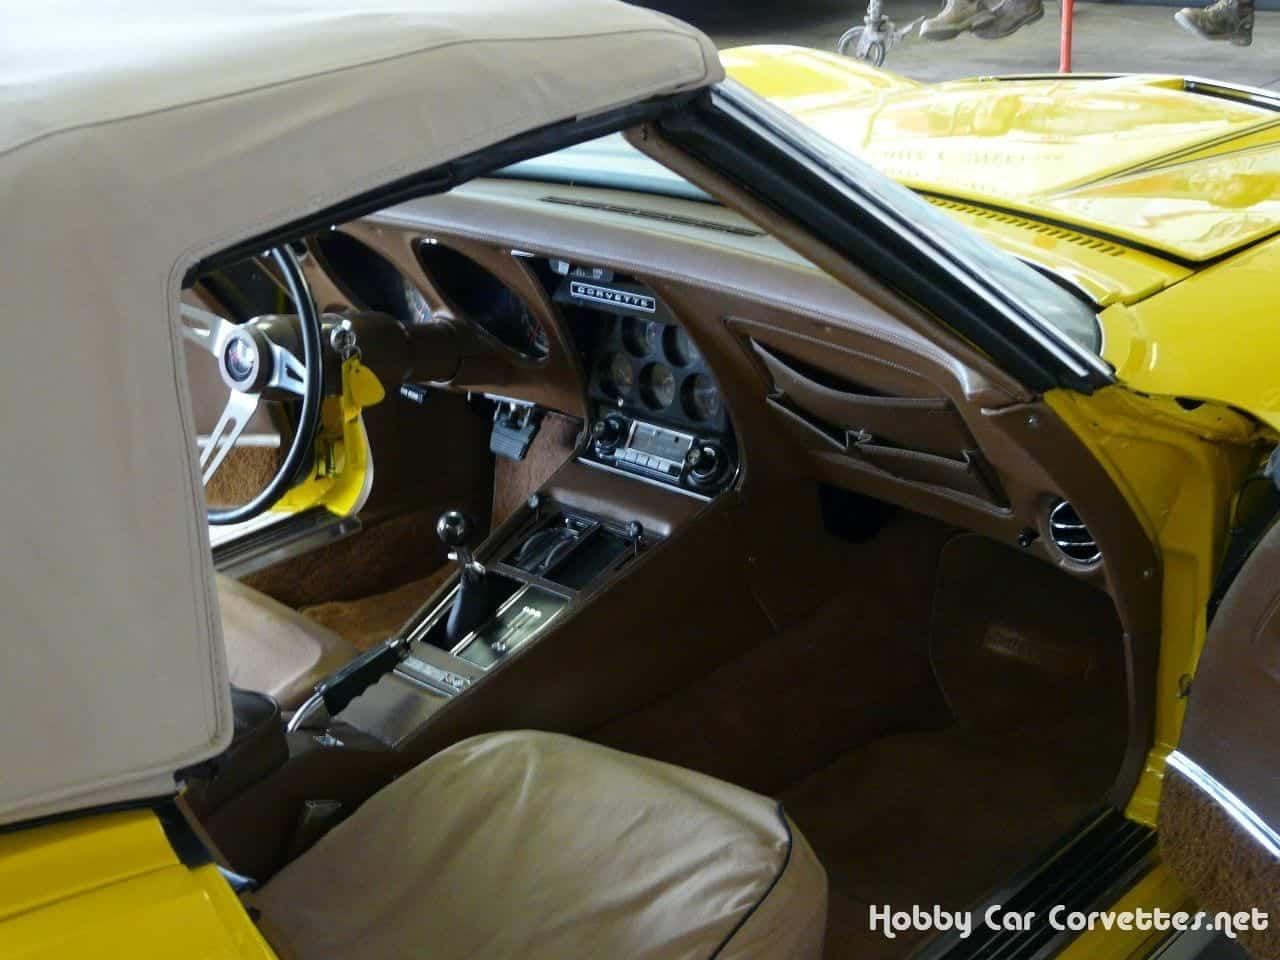 1972 Sunflower Yellow Corvette LT1 Convertible